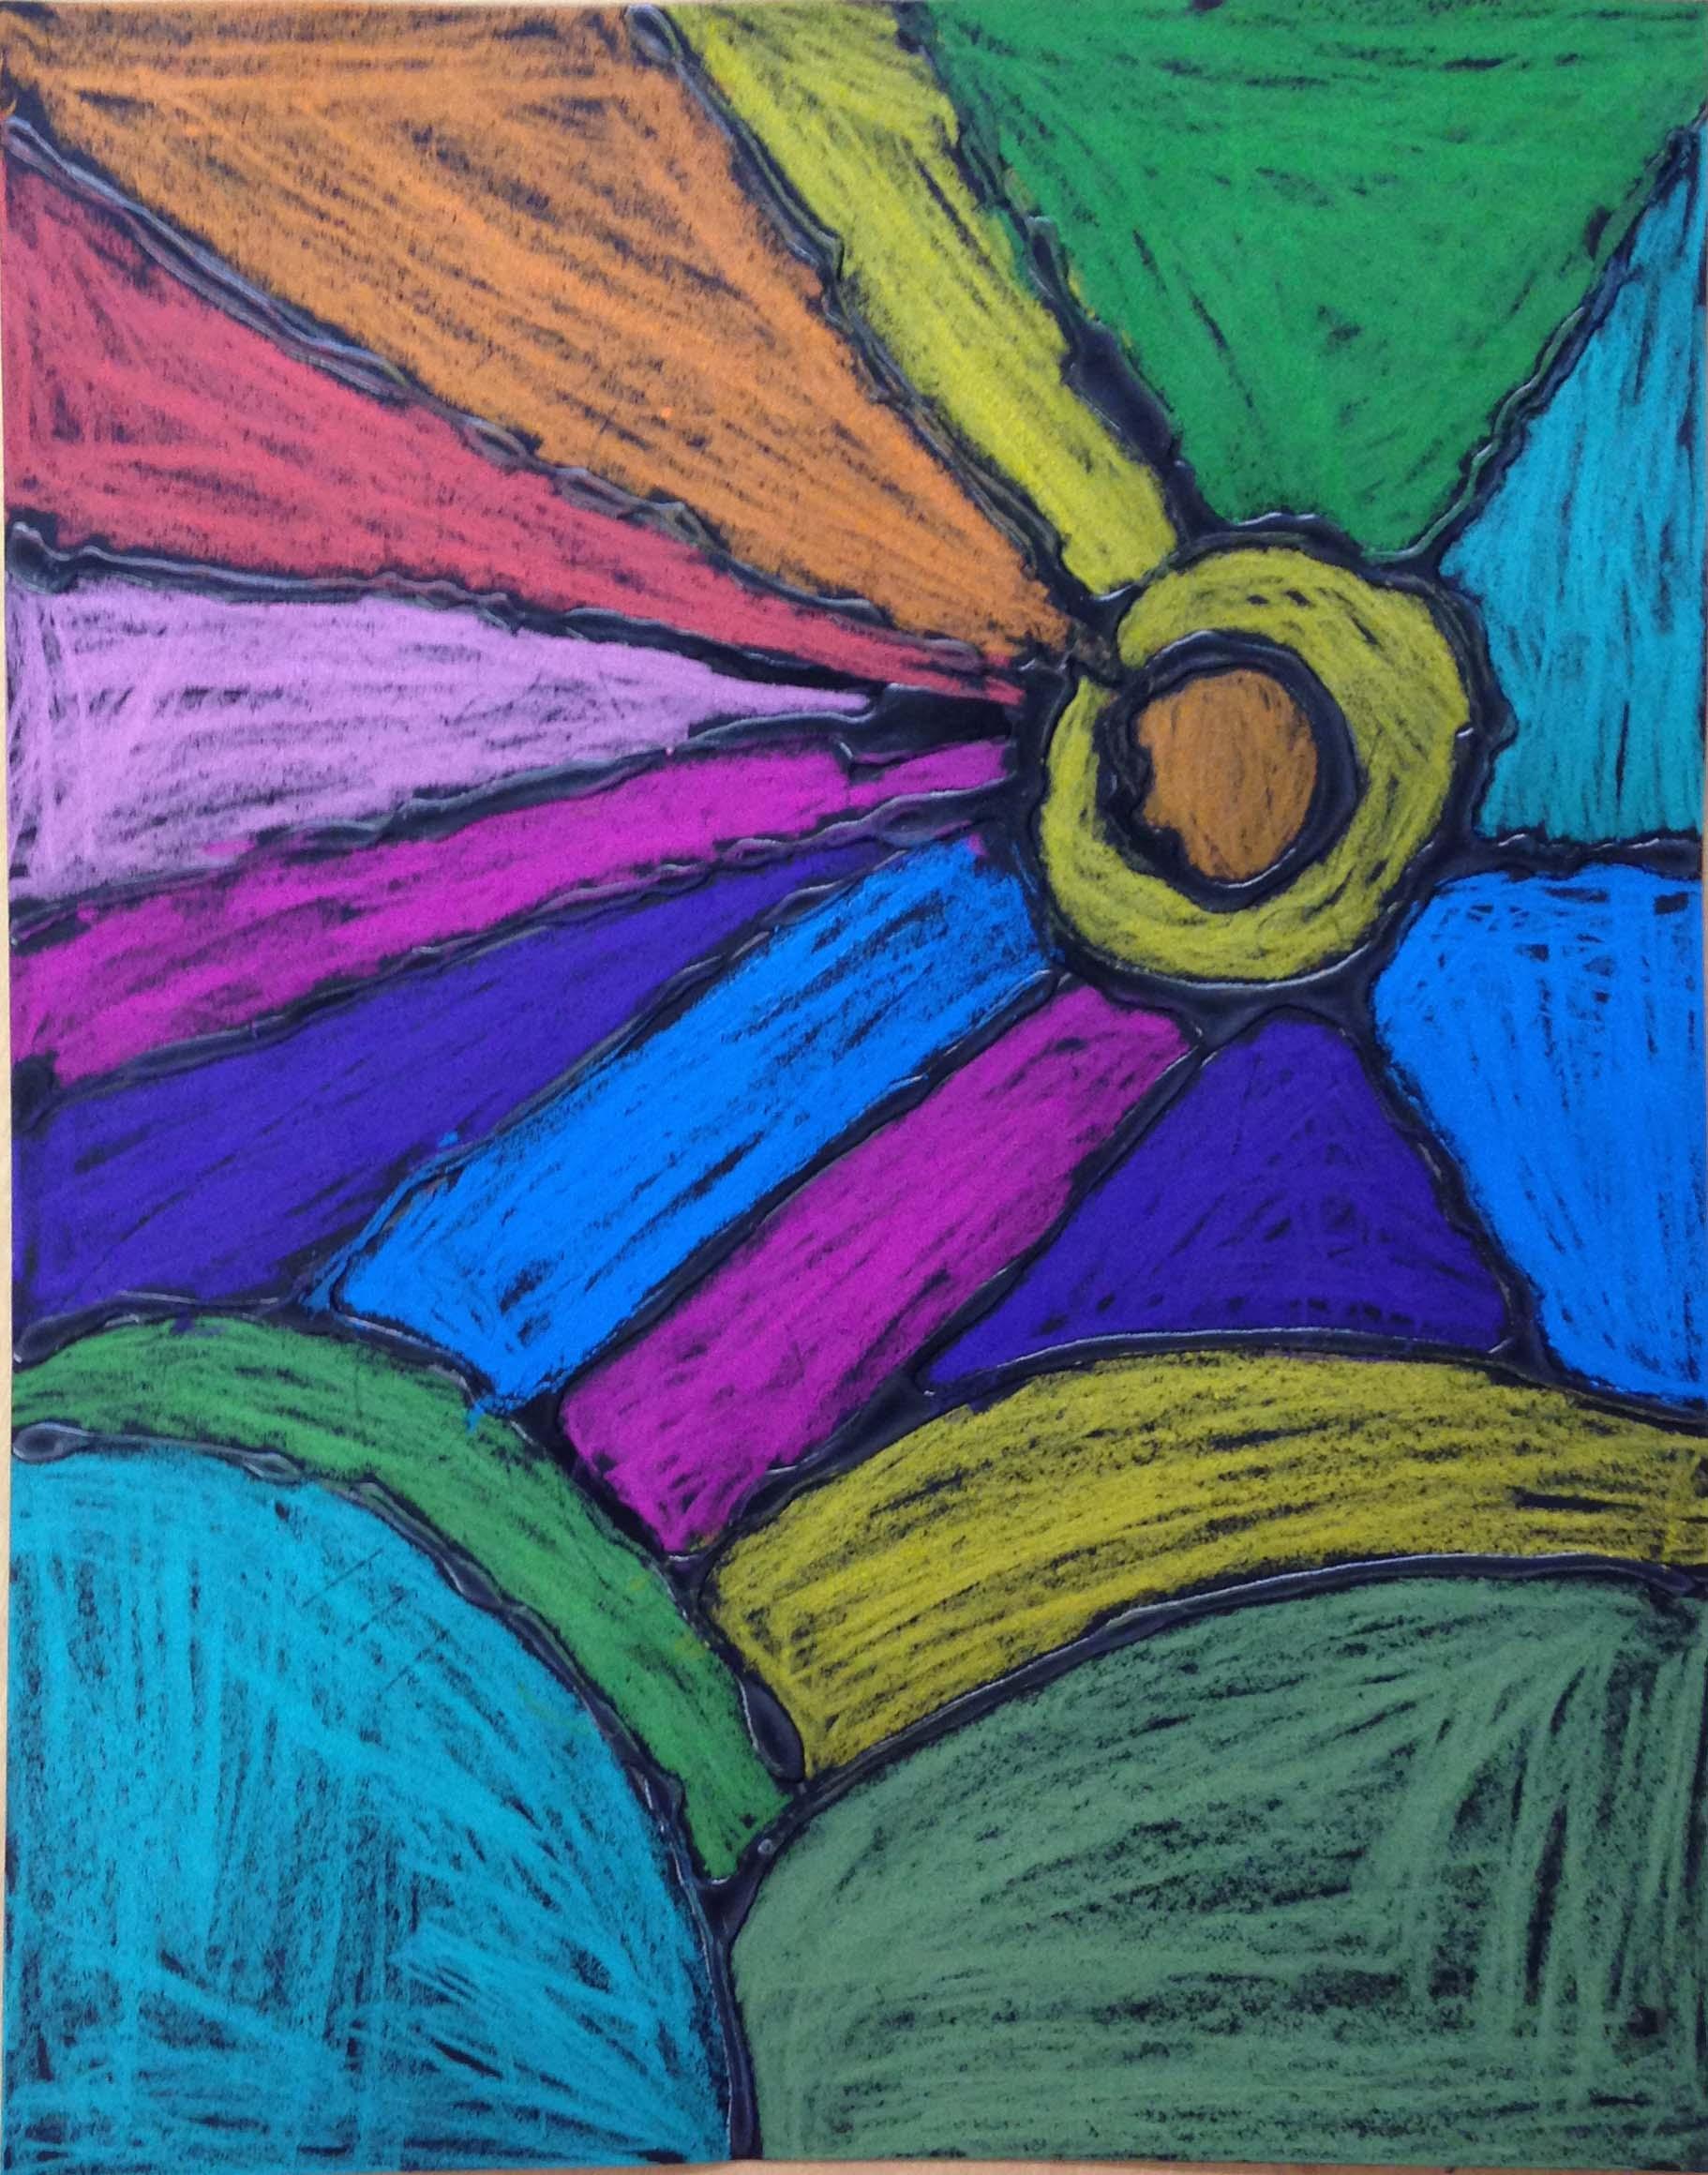 Color Stick Landscape - Art Projects for Kids